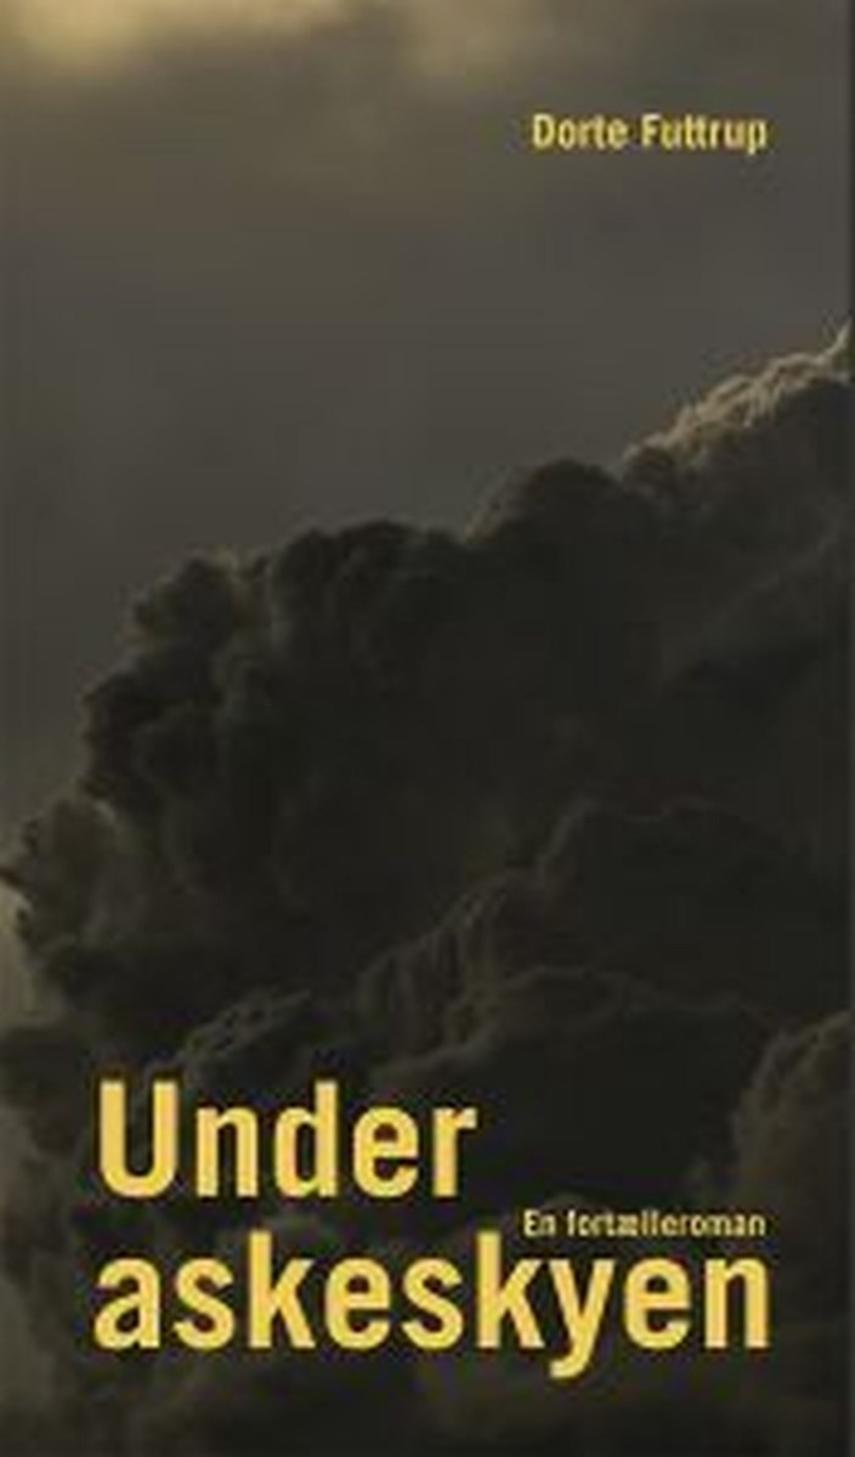 Dorte Futtrup: Under askeskyen : en fortælleroman